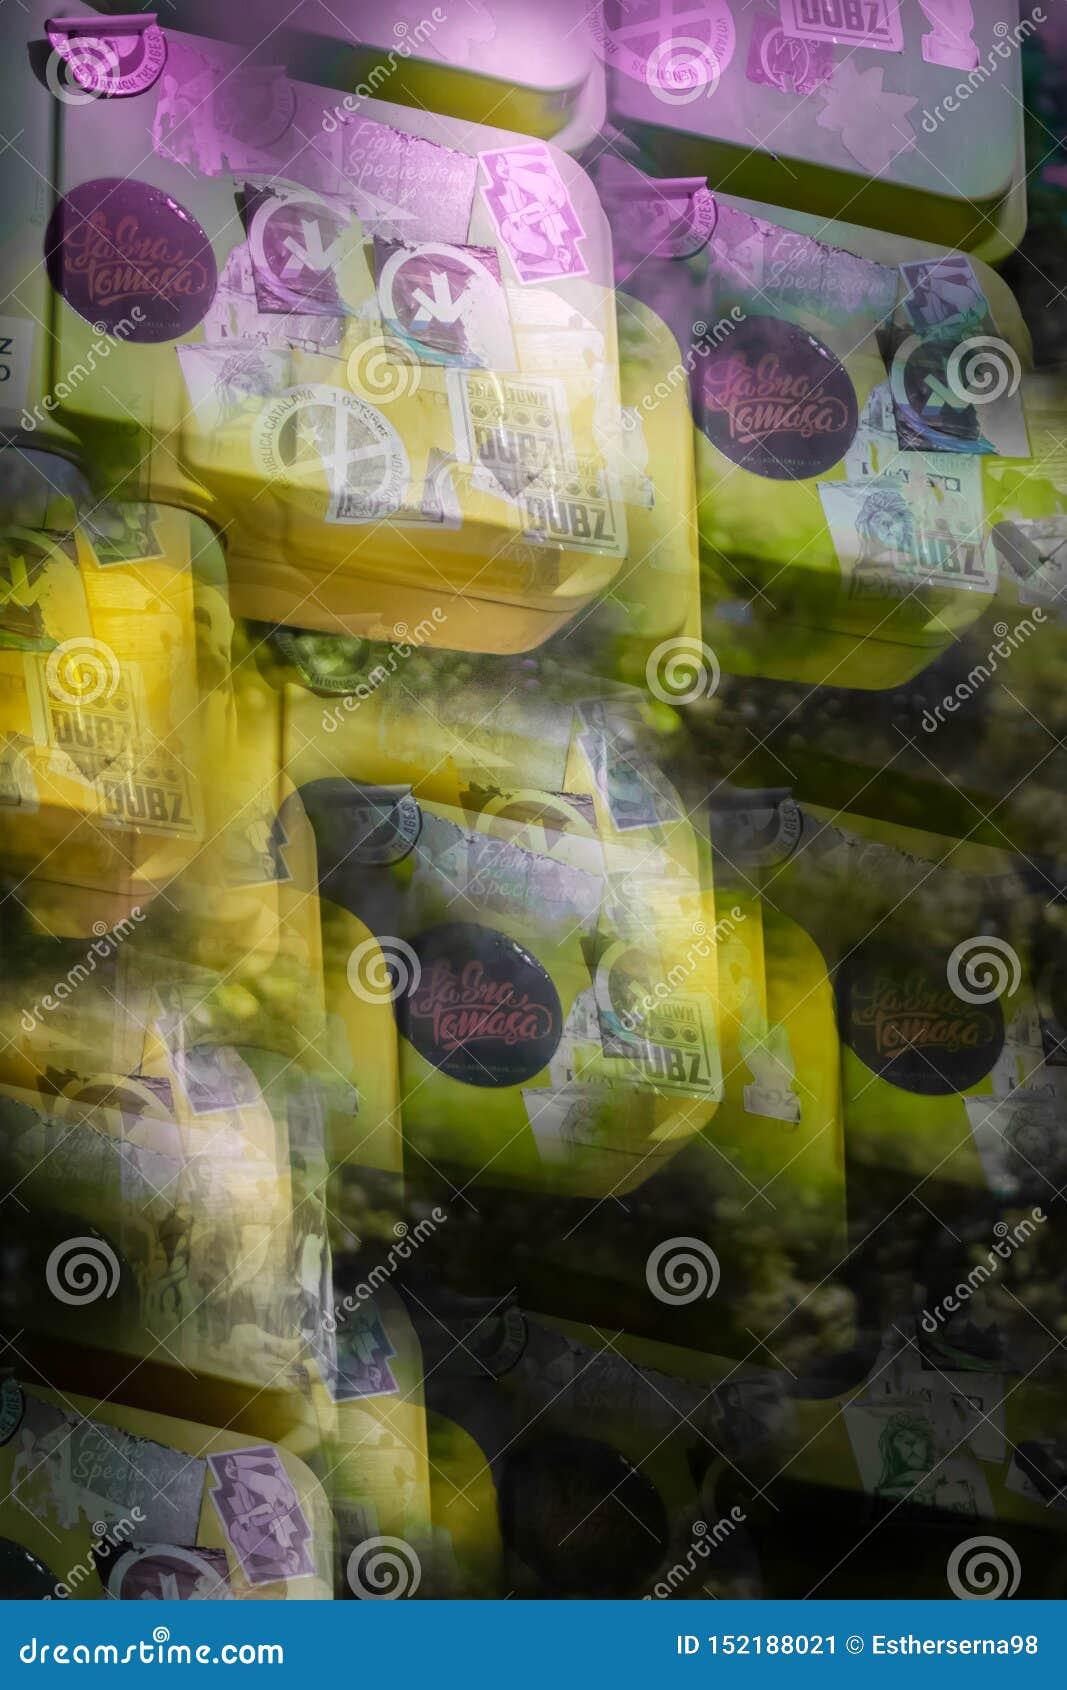 Imagen abstracta de un semáforo